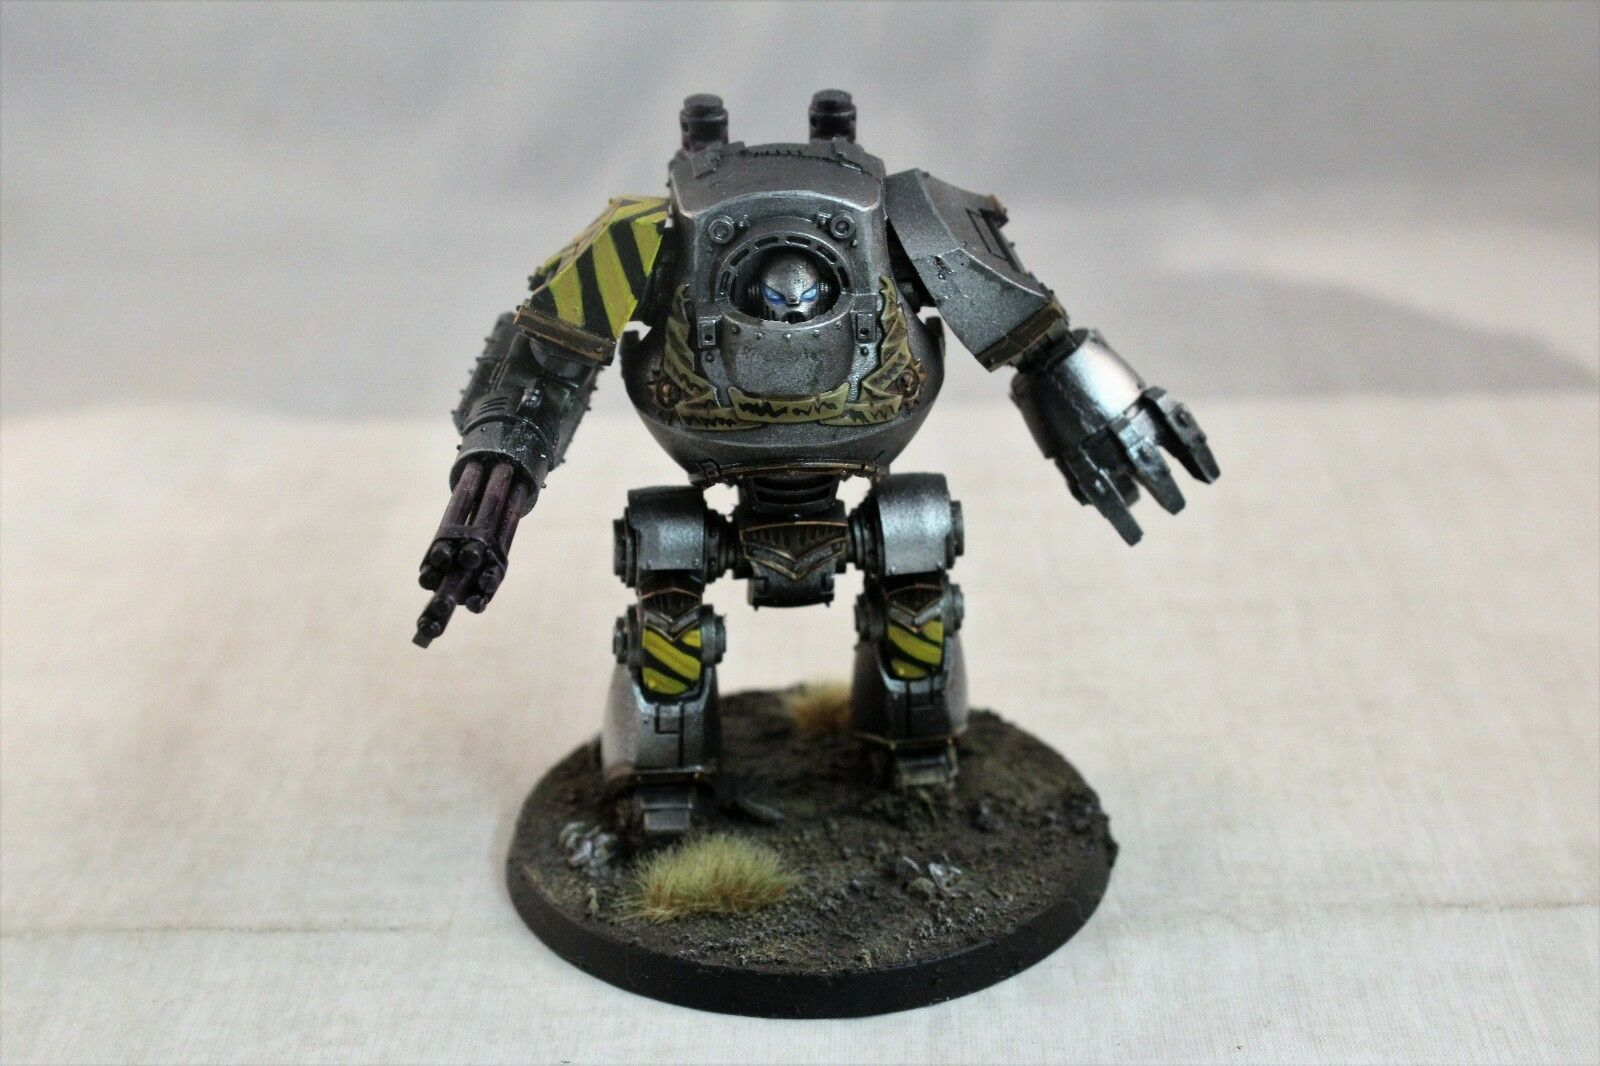 Warhammer Space Marine Iron Warriors Contemptor Dreadnought Well Painted